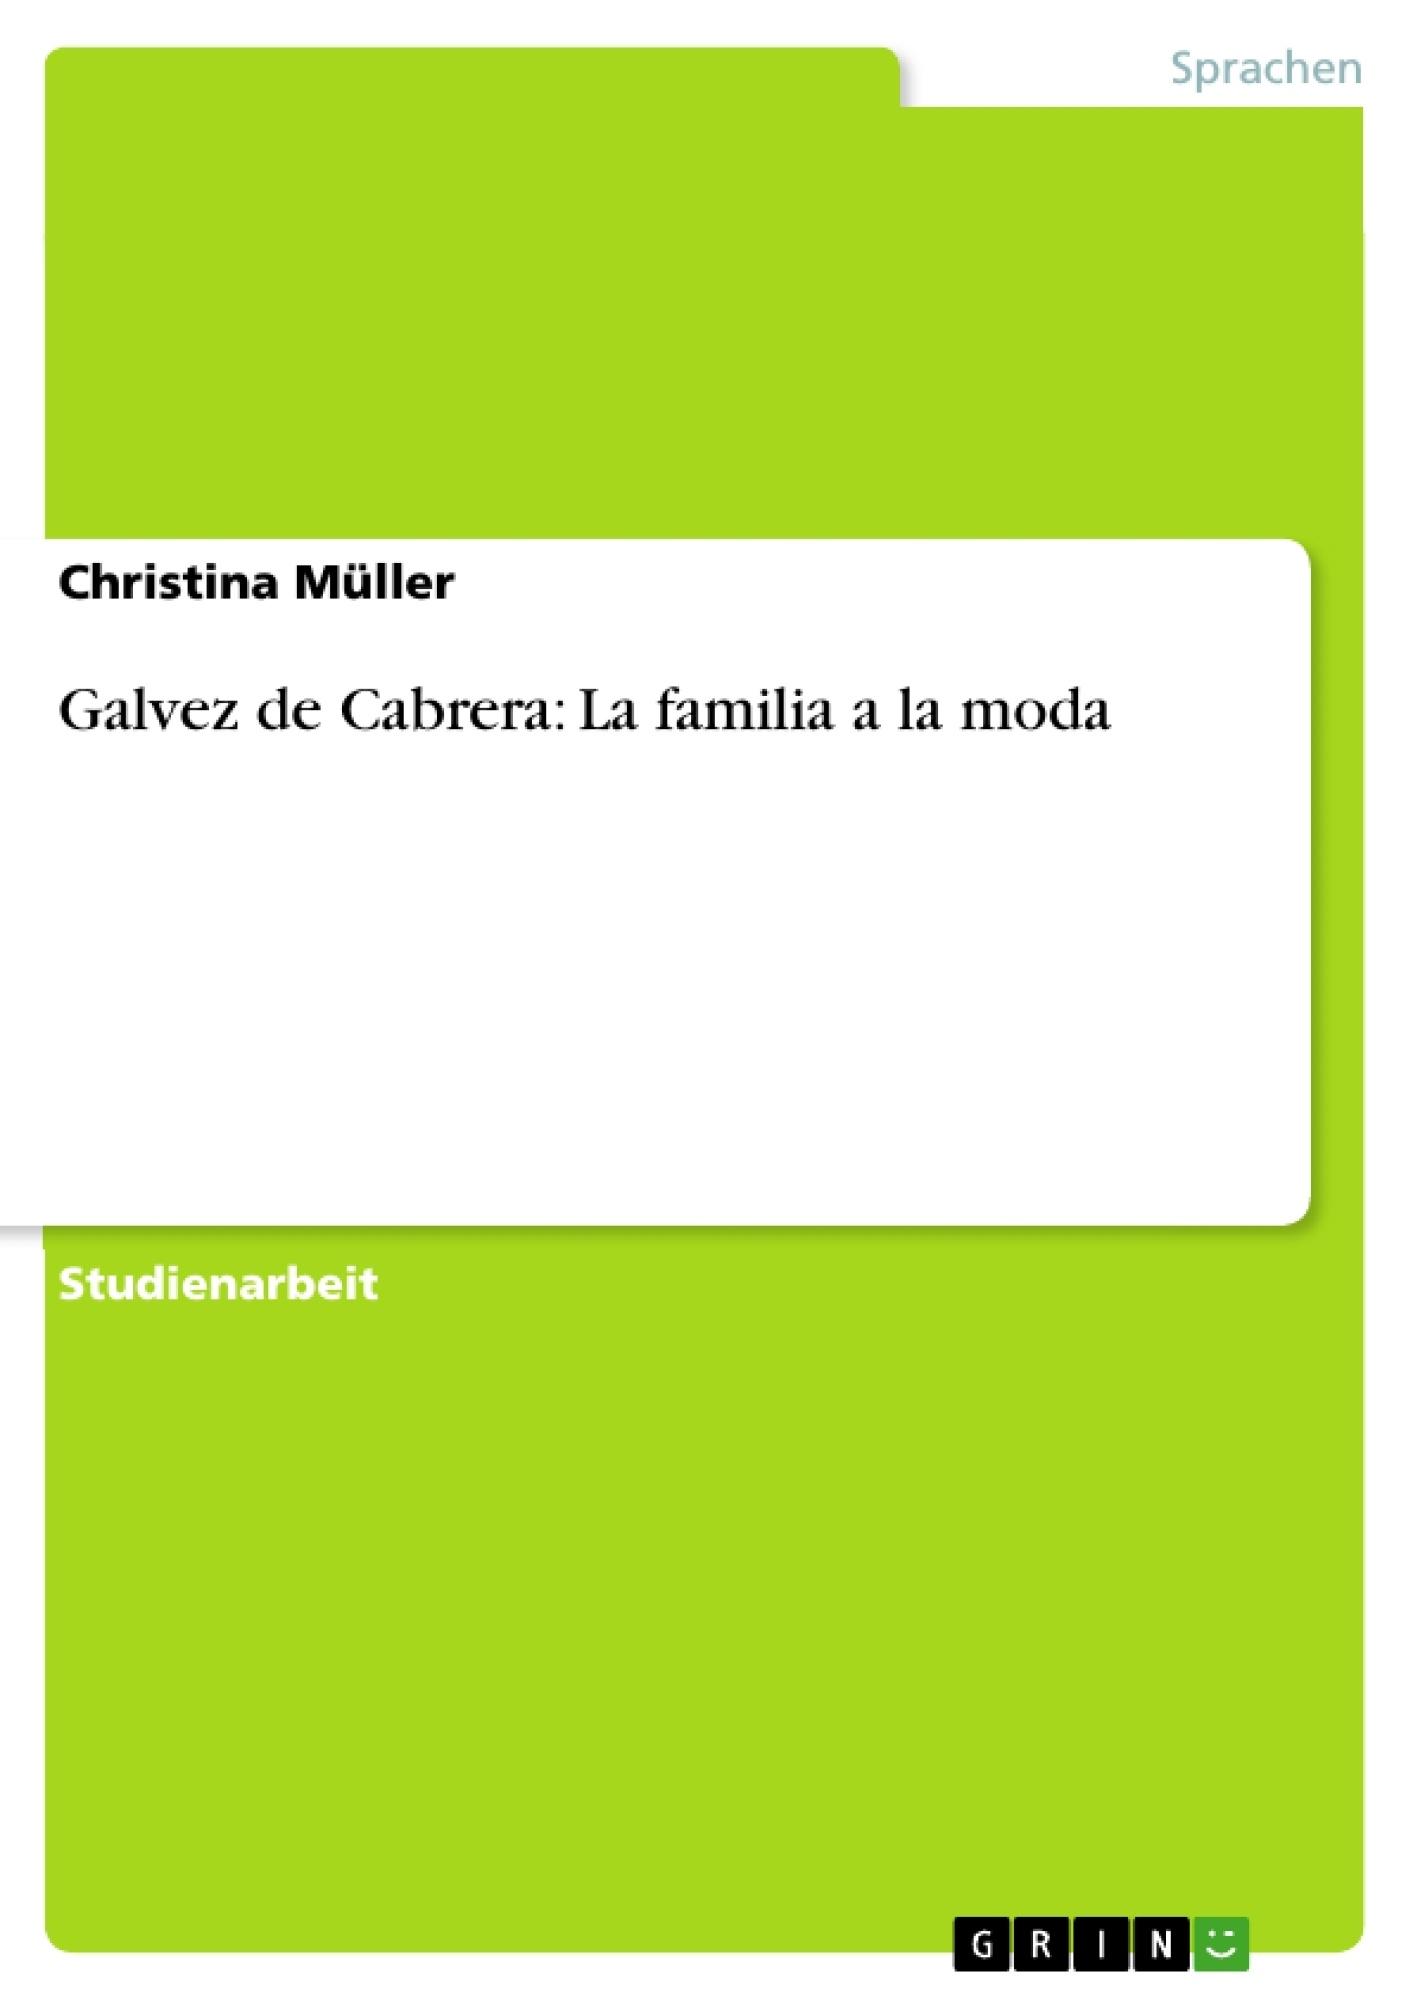 Titel: Galvez de Cabrera: La familia a la moda